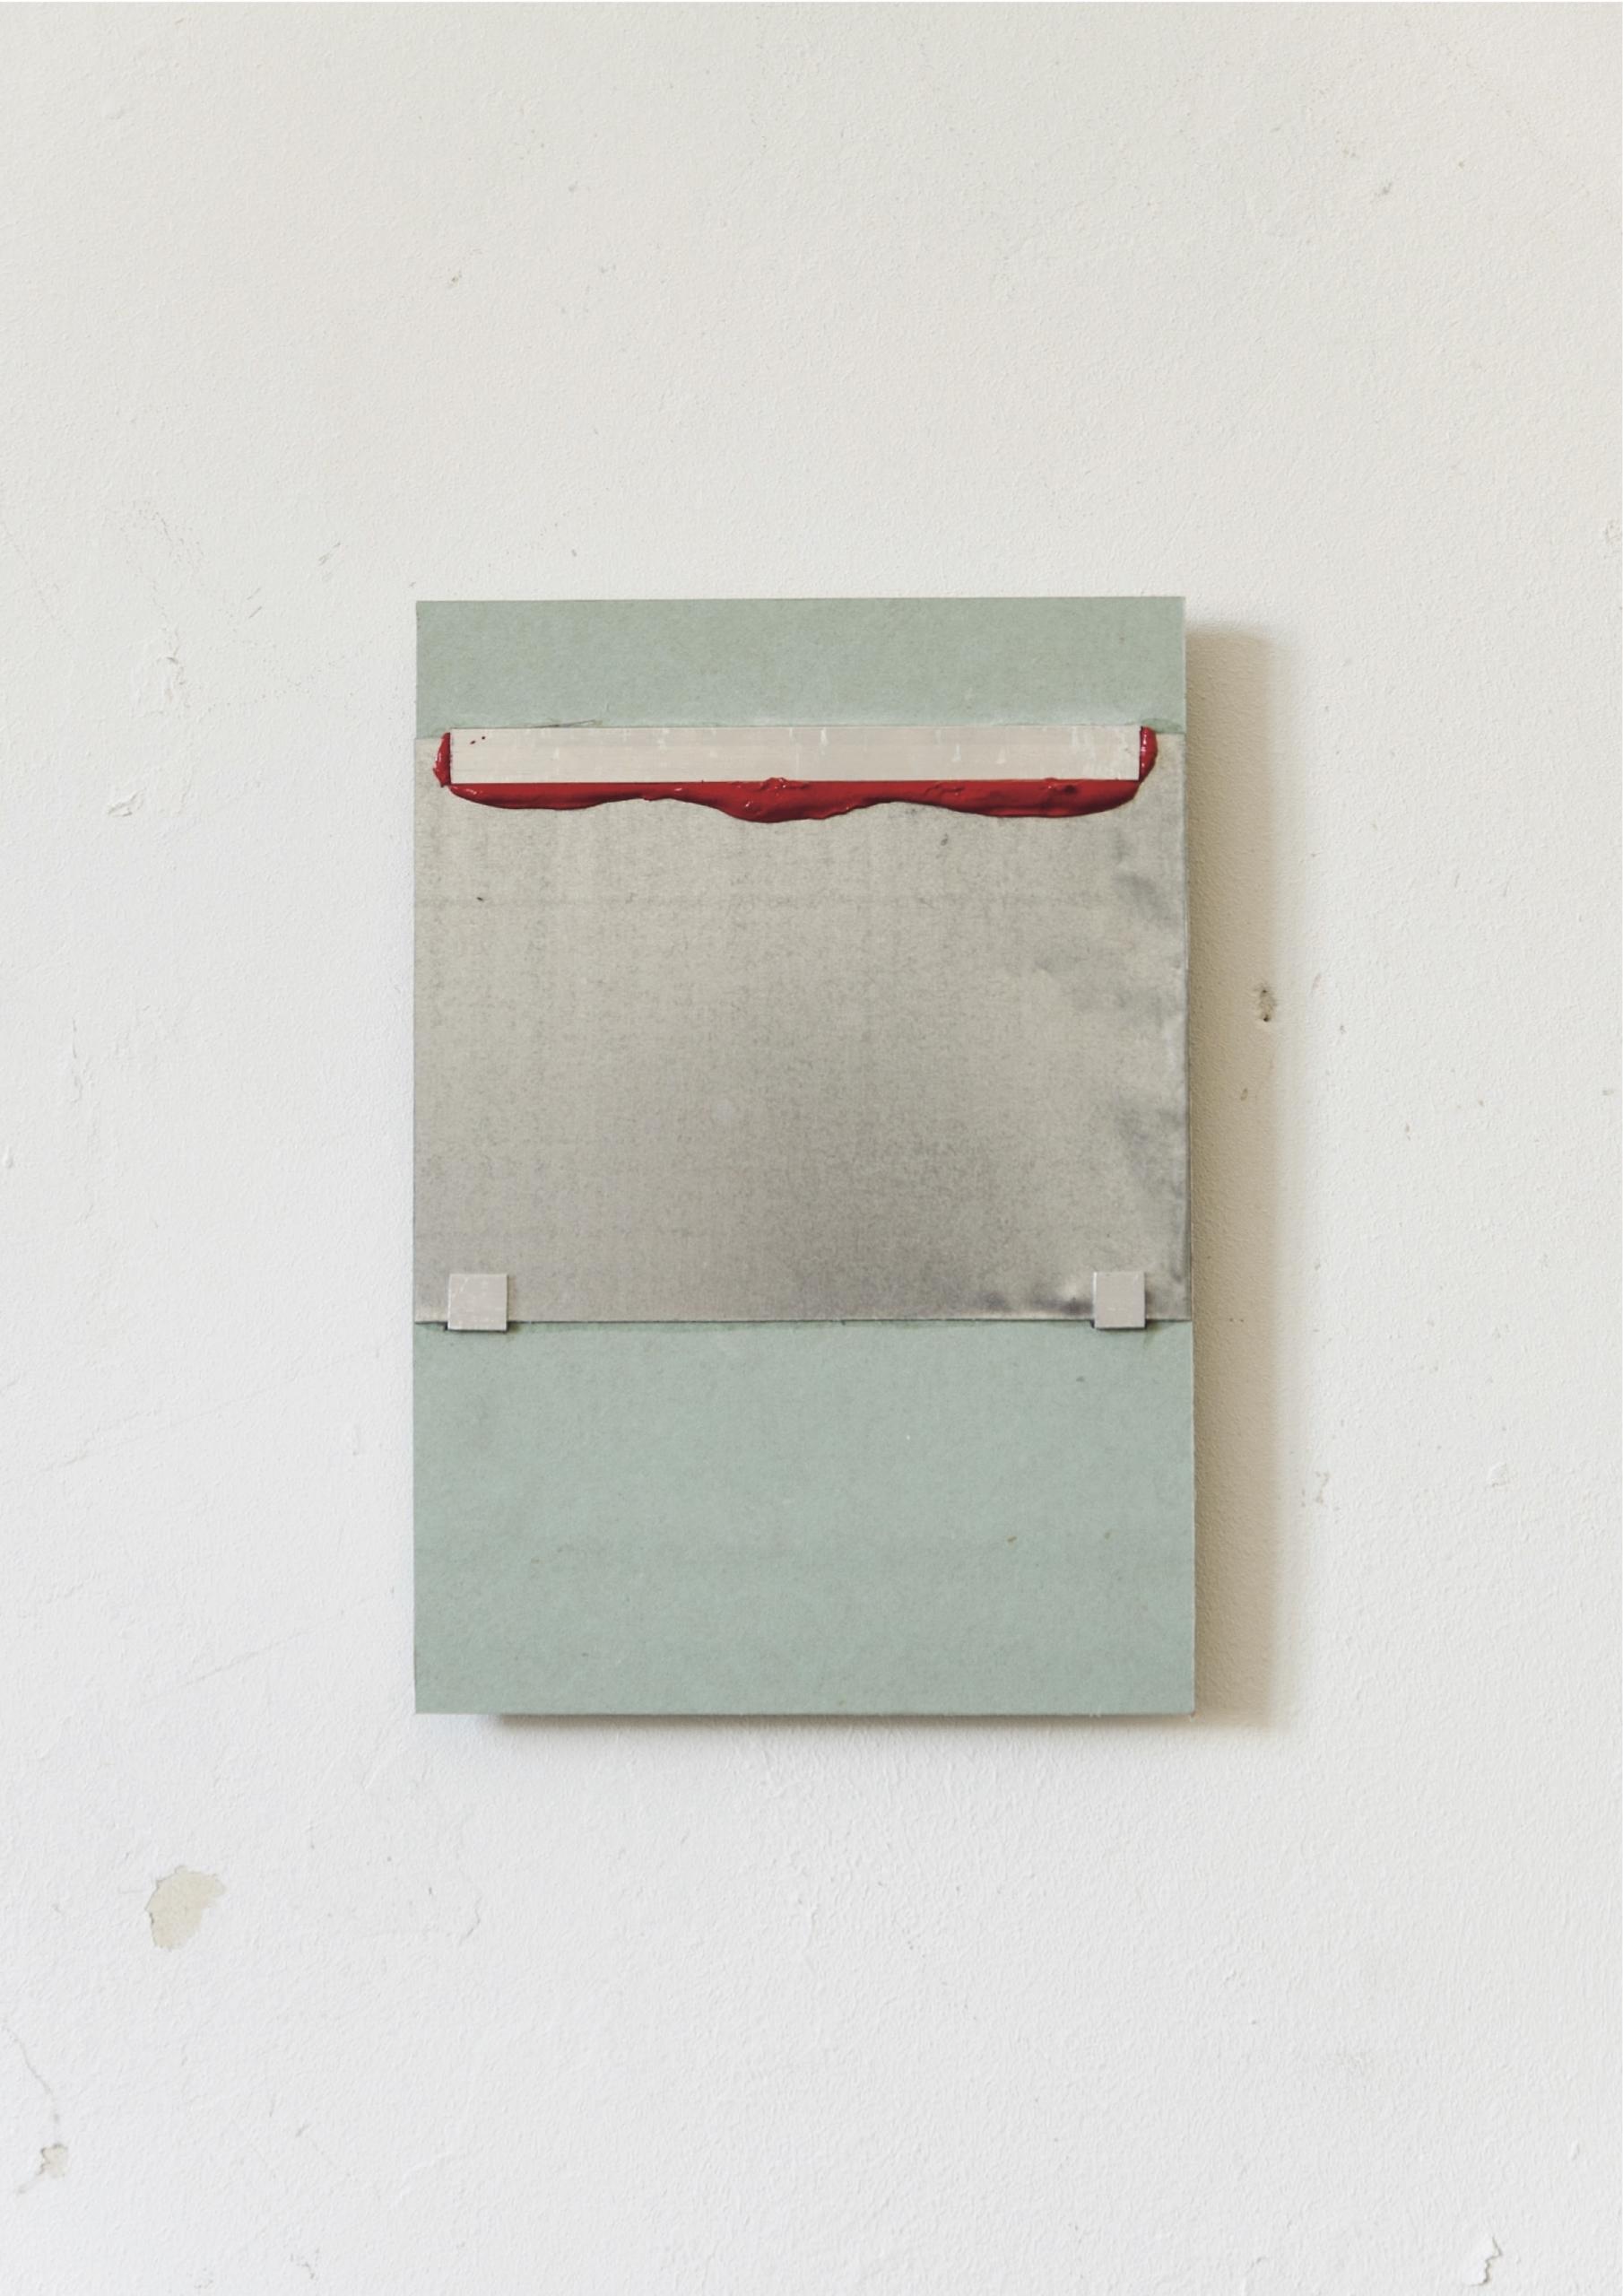 Kriz Olbricht paintings, 2016. Plasterboard, aluminum profiles, galvanized steel sheet, oil. 14,5 x 21 cm.